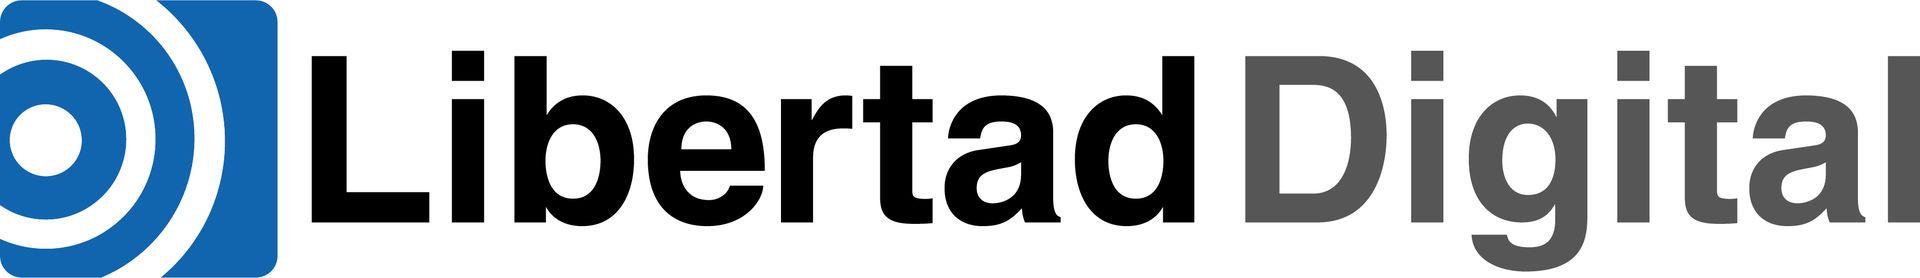 libertaddigital-logo